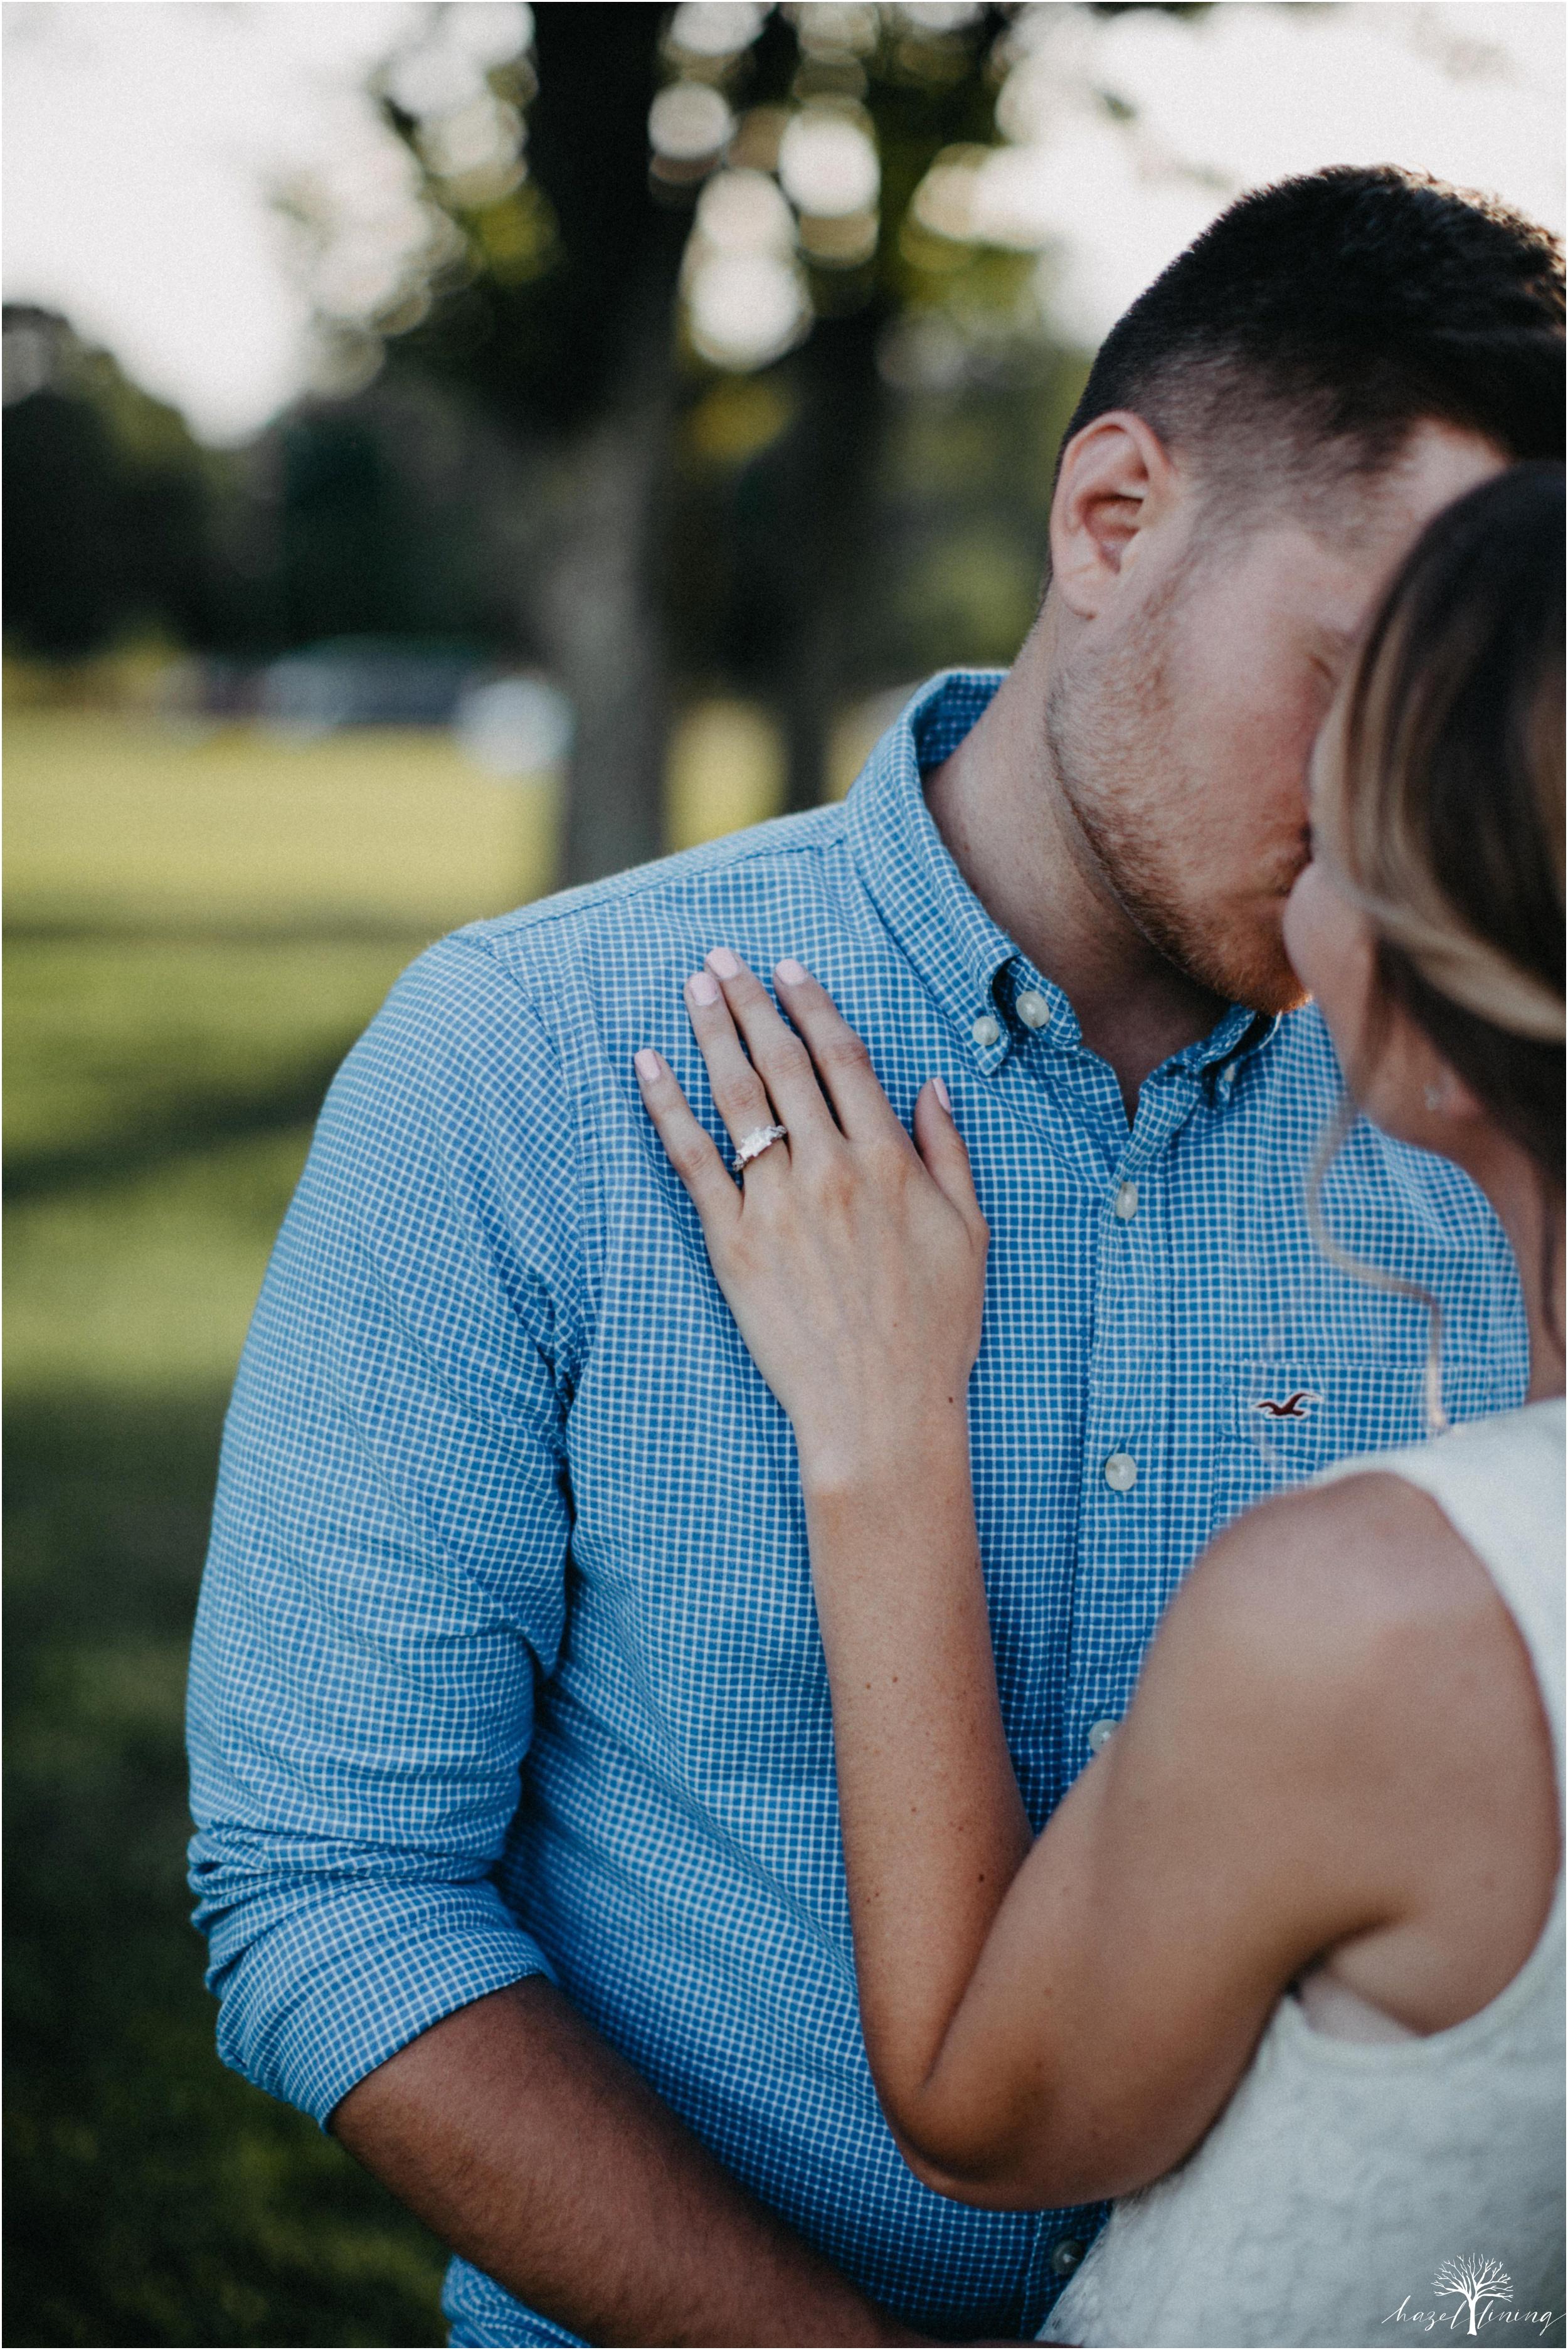 rachel-warner-chris-niedrist-the-farm-bakery-and-events-quakertown-pa-summer-engagement-hazel-lining-photography-destination-elopement-wedding-engagement-photography_0025.jpg